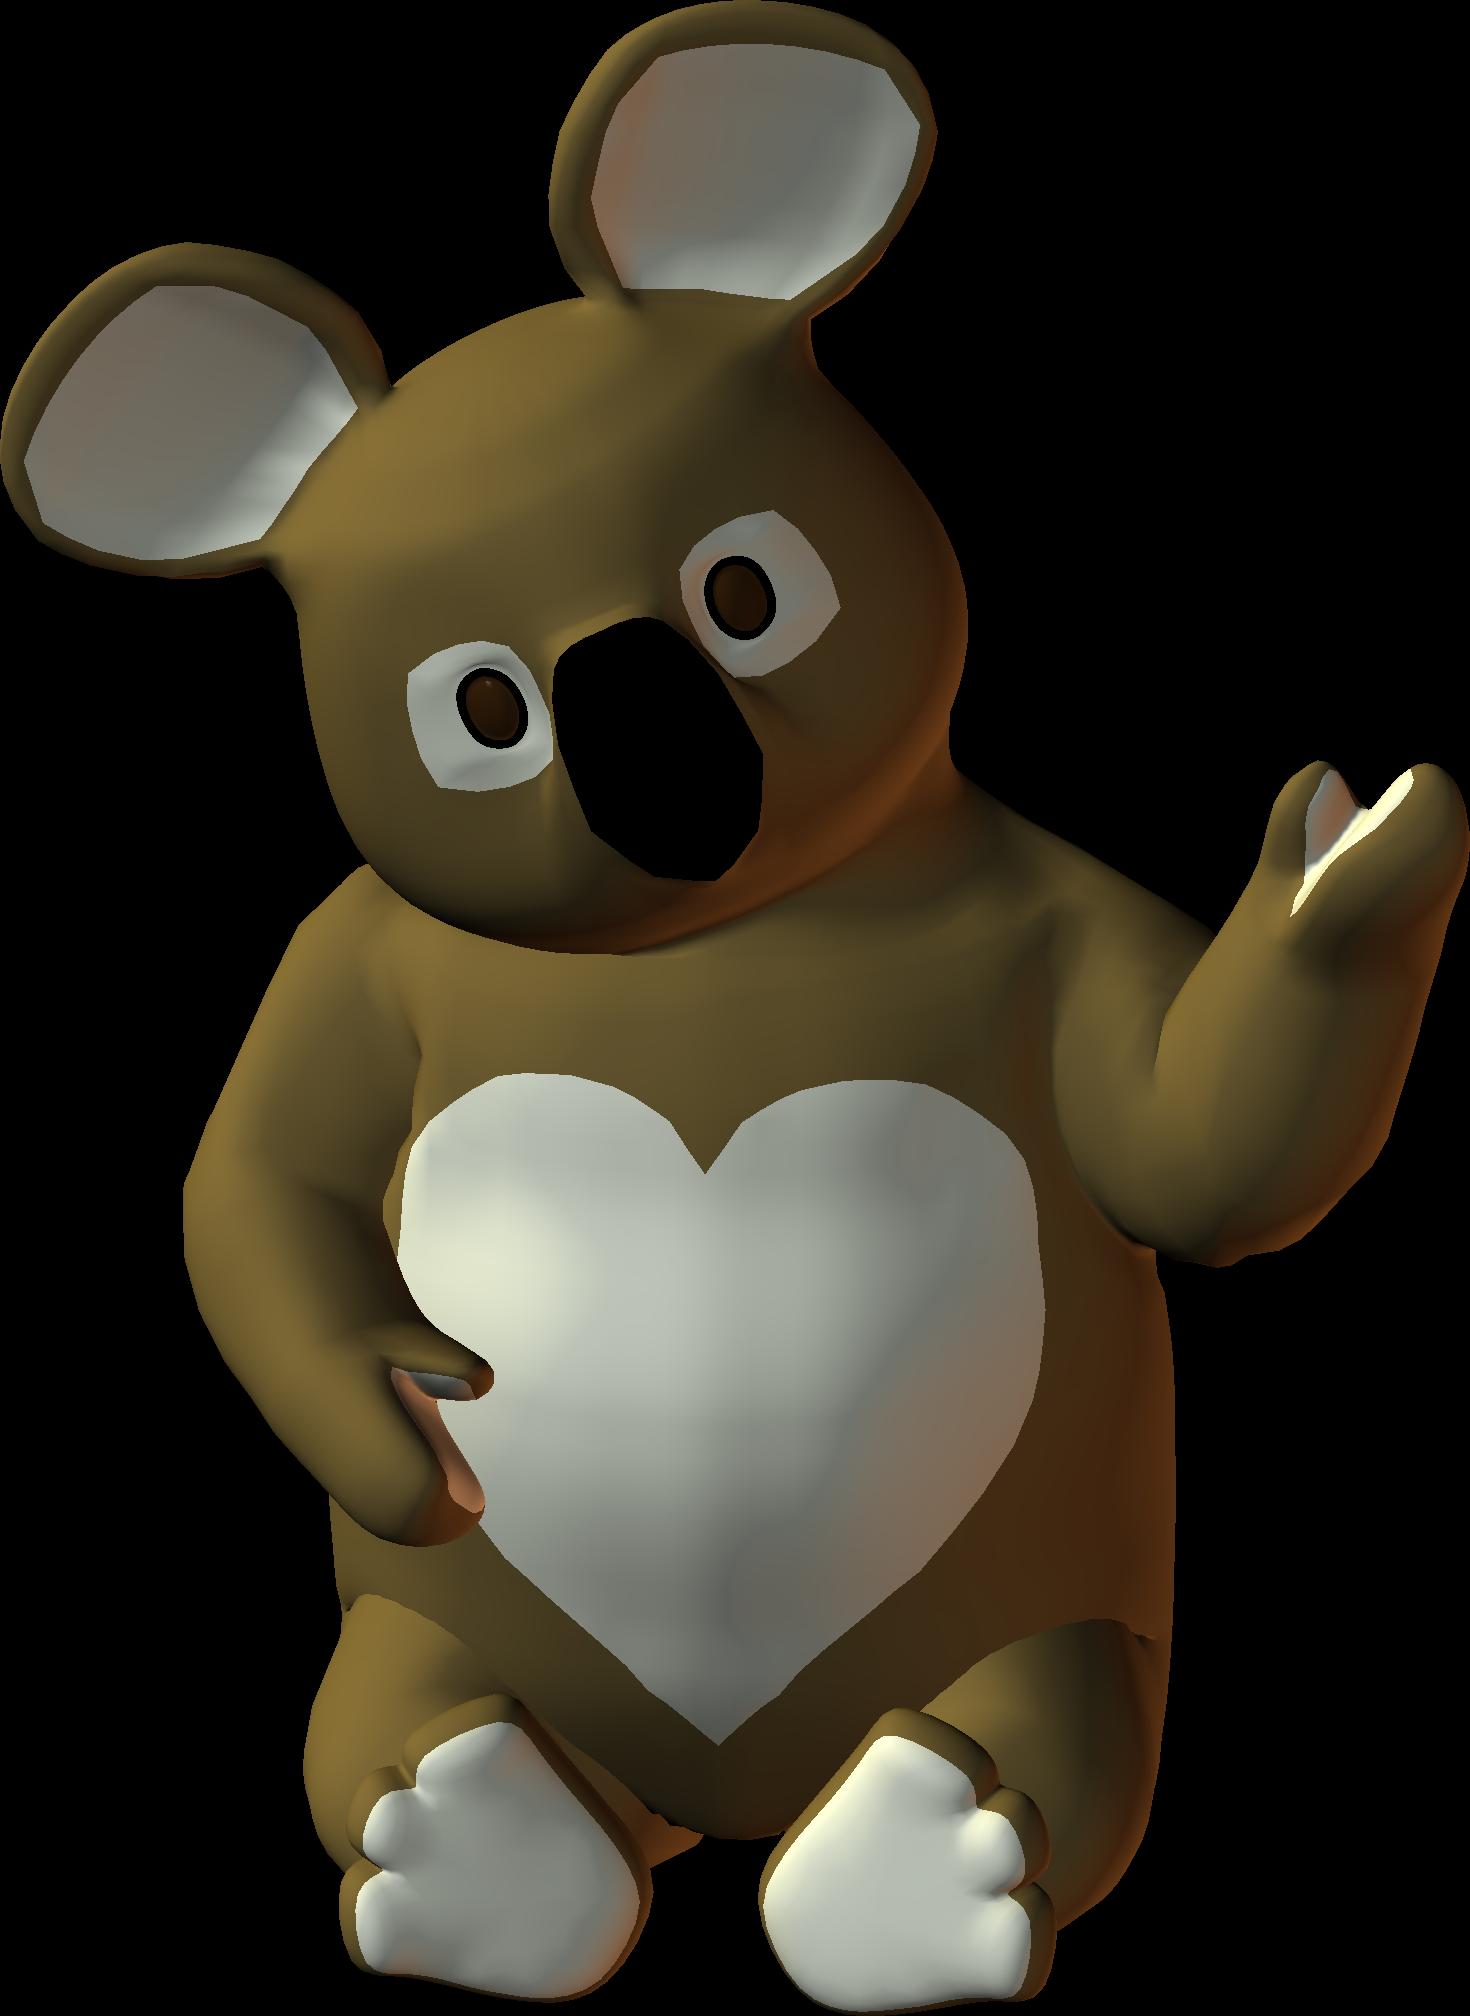 Clipart animals koala. Png heart bear by